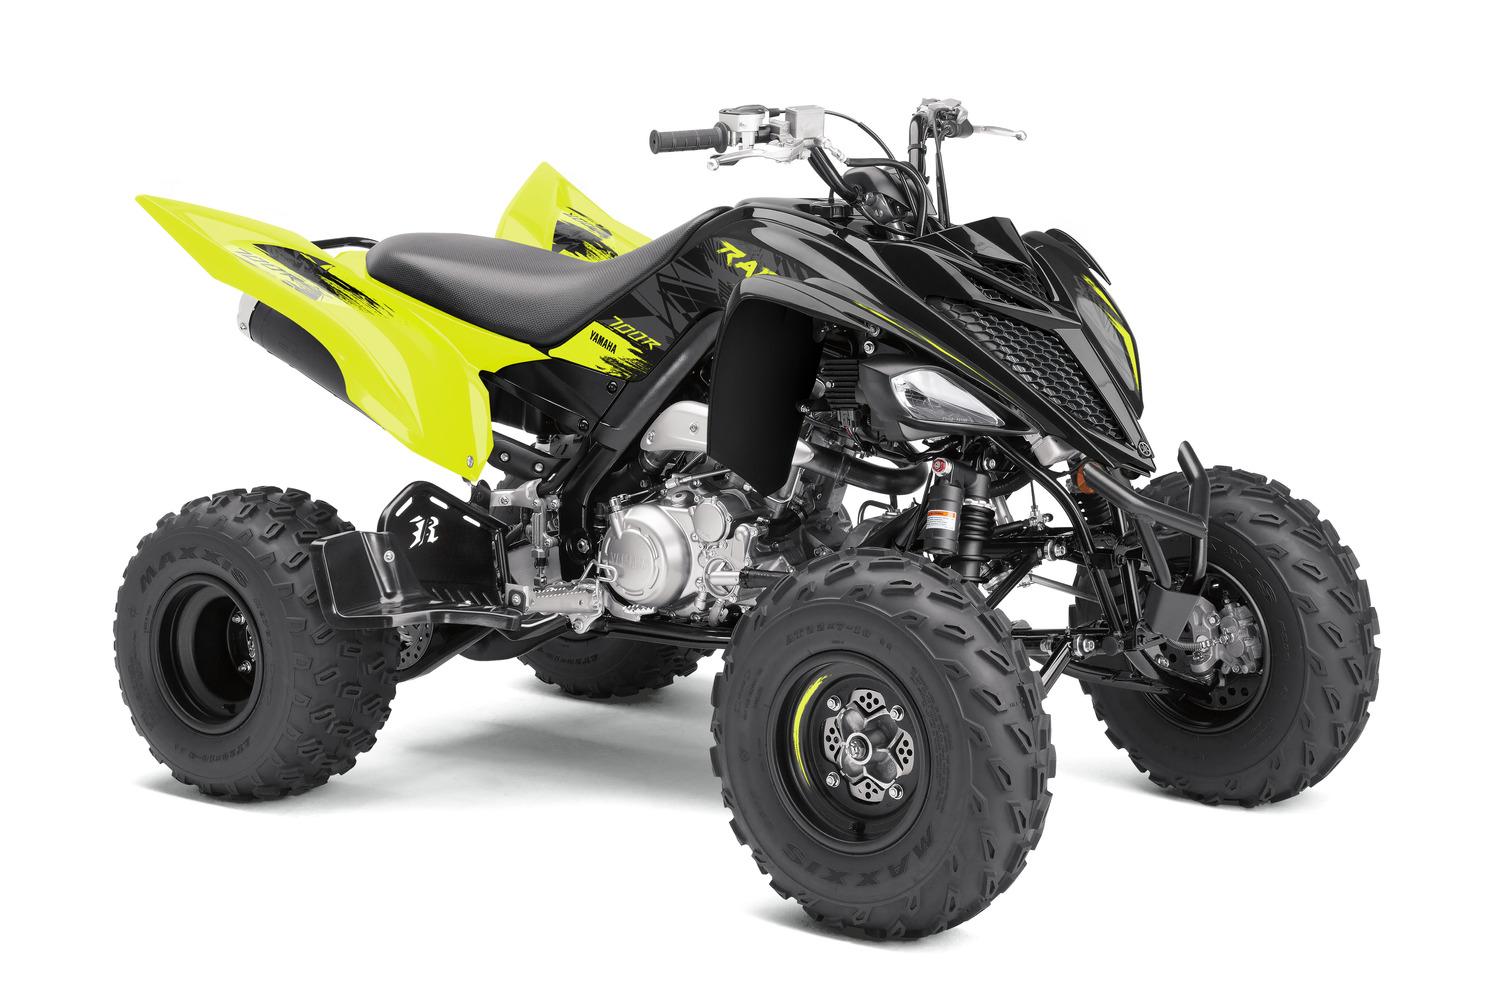 2021 Yamaha Raptor 700R SE in Yamaha Black Yellow